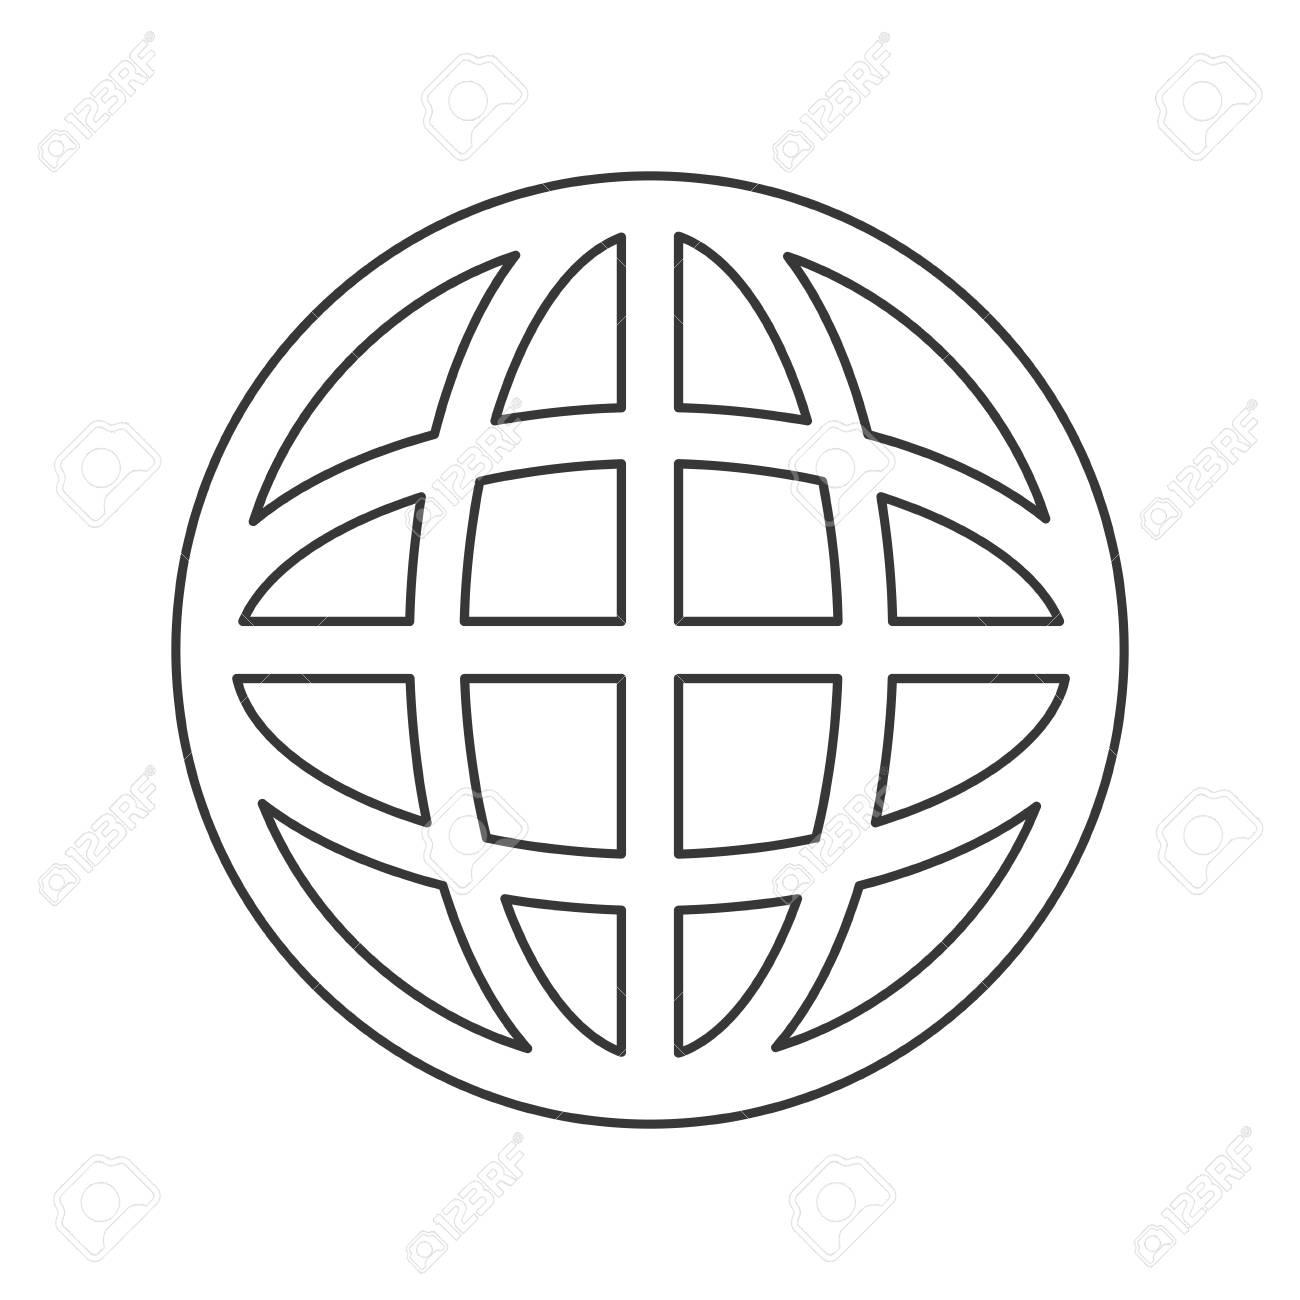 simple flat design earth globe diagram icon vector illustration User Icon simple flat design earth globe diagram icon vector illustration stock vector 59317264